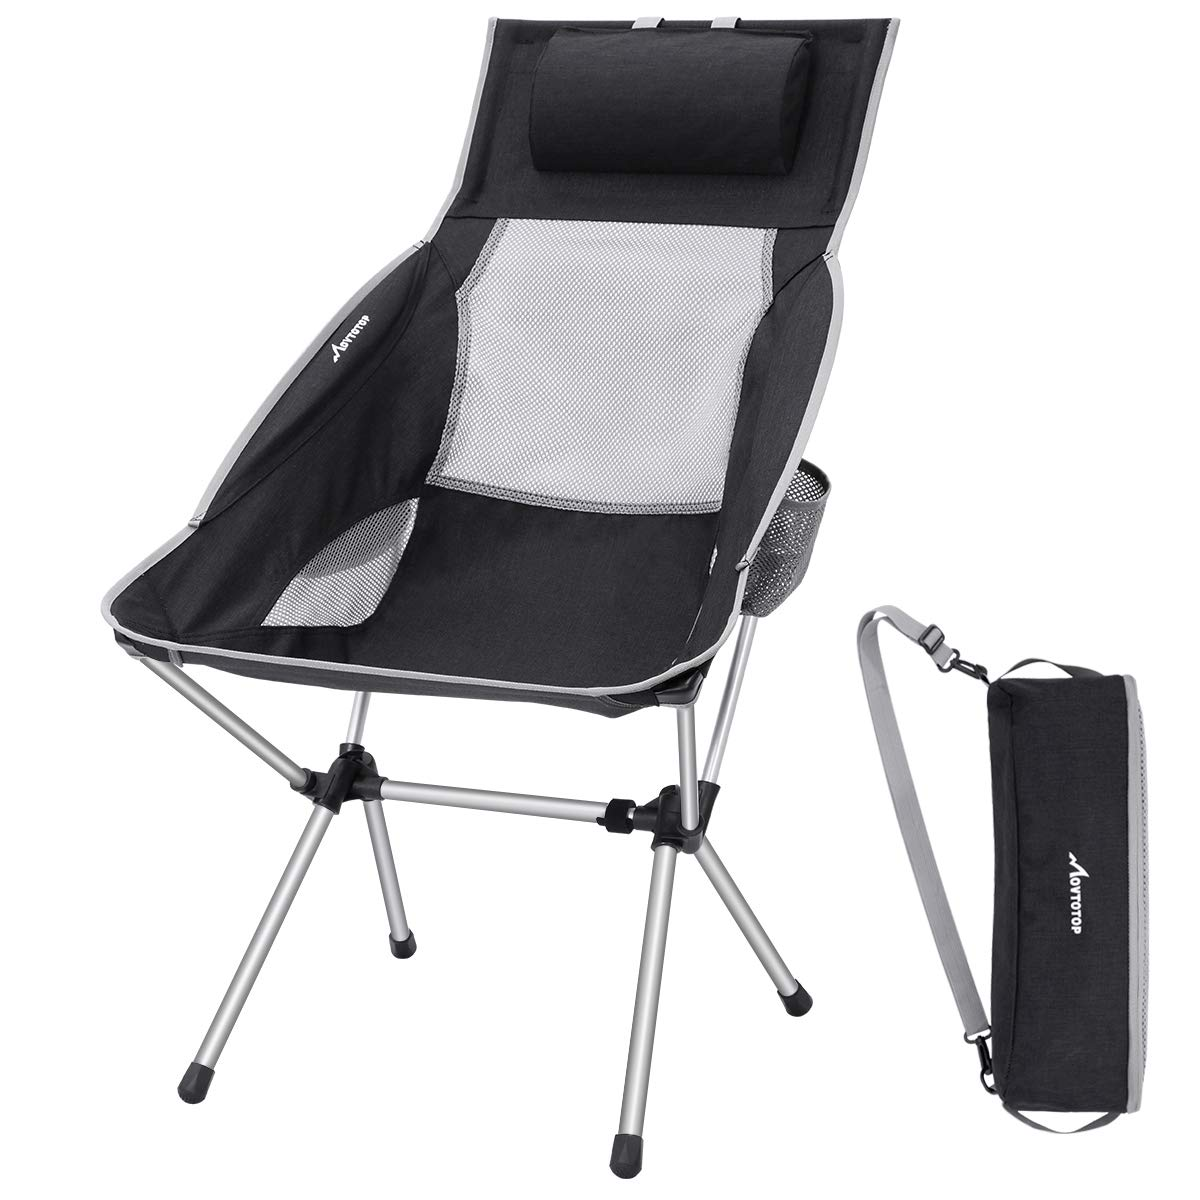 MOVTOTOP Silla de Camping Plegable con reposacabezas, sillas ...